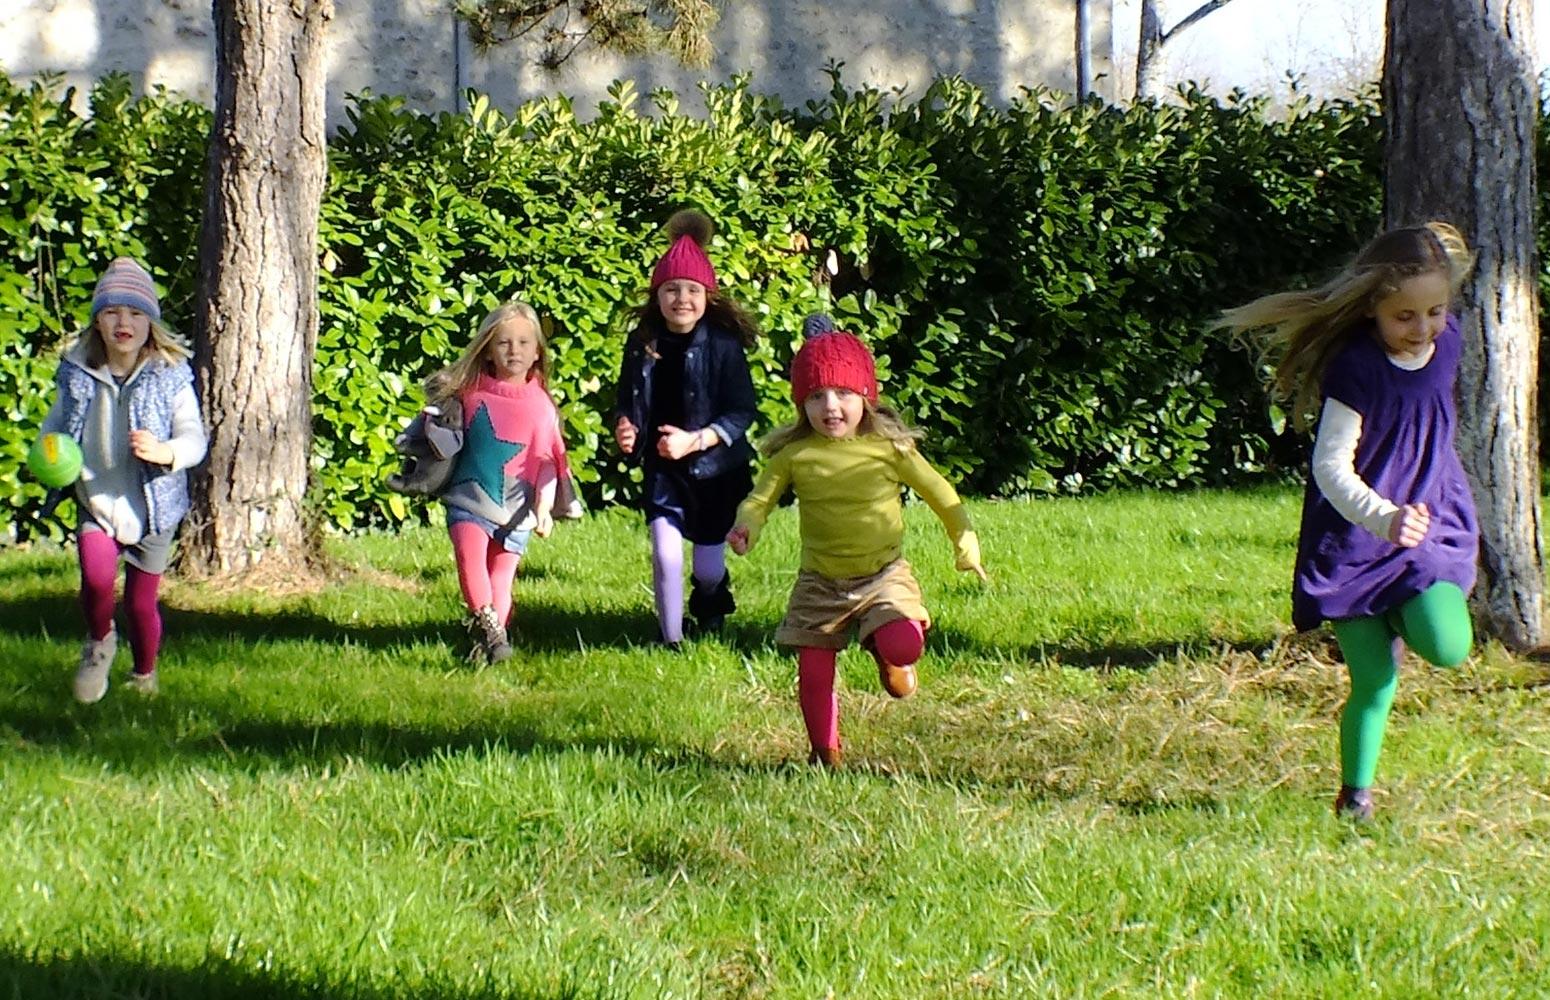 Country Kids Girls Luxury Warm Winter Tights Sage Green 9-11 Years Manufacturer Size Years UK